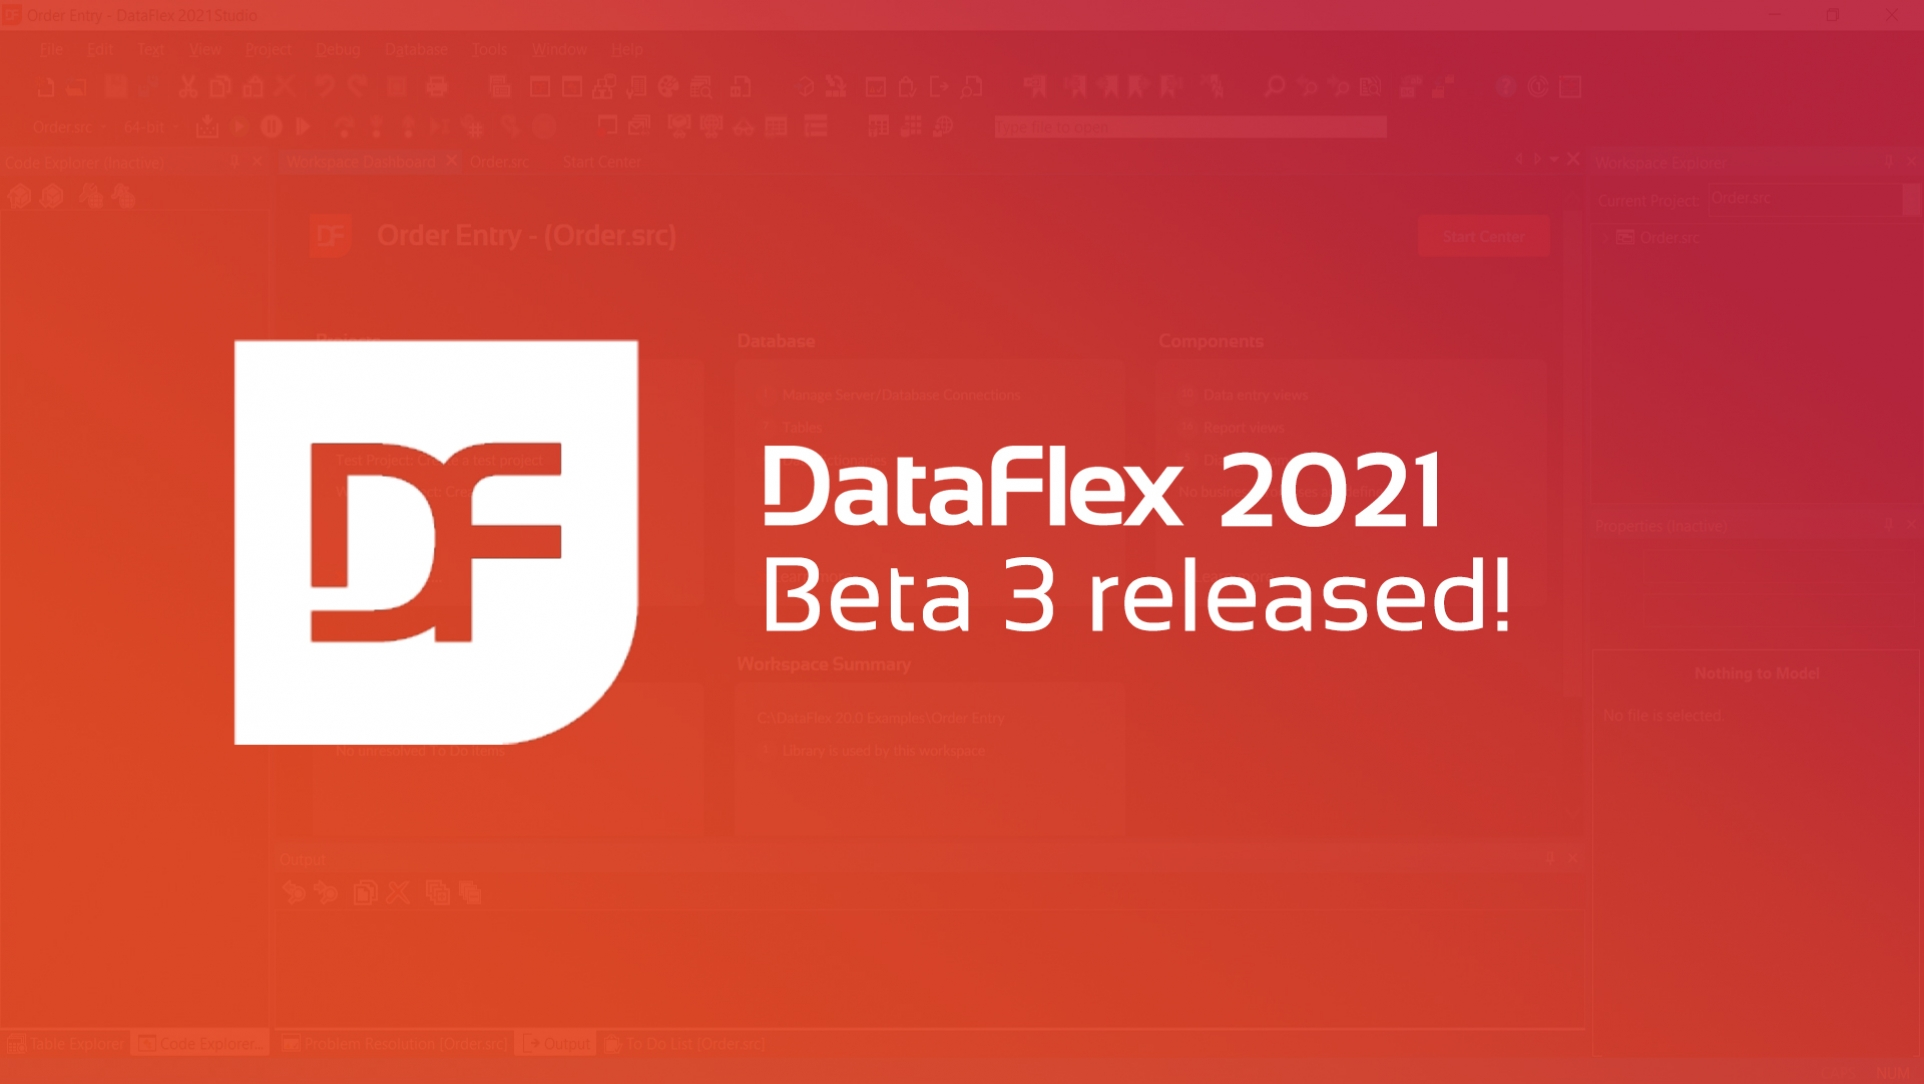 New Release: DataFlex 2021 Beta 3